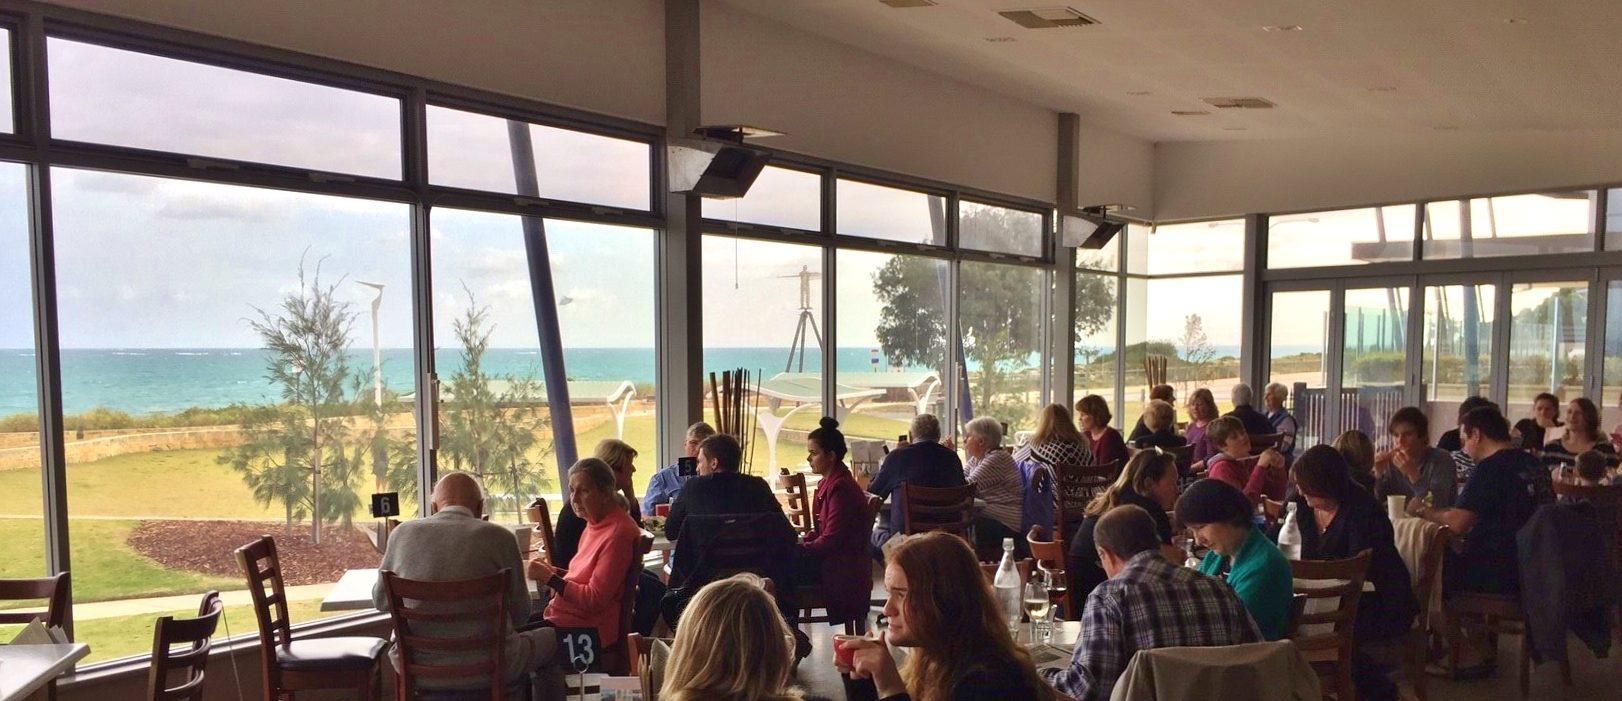 Portofinos Restaurant Cafe Function Venue Perth